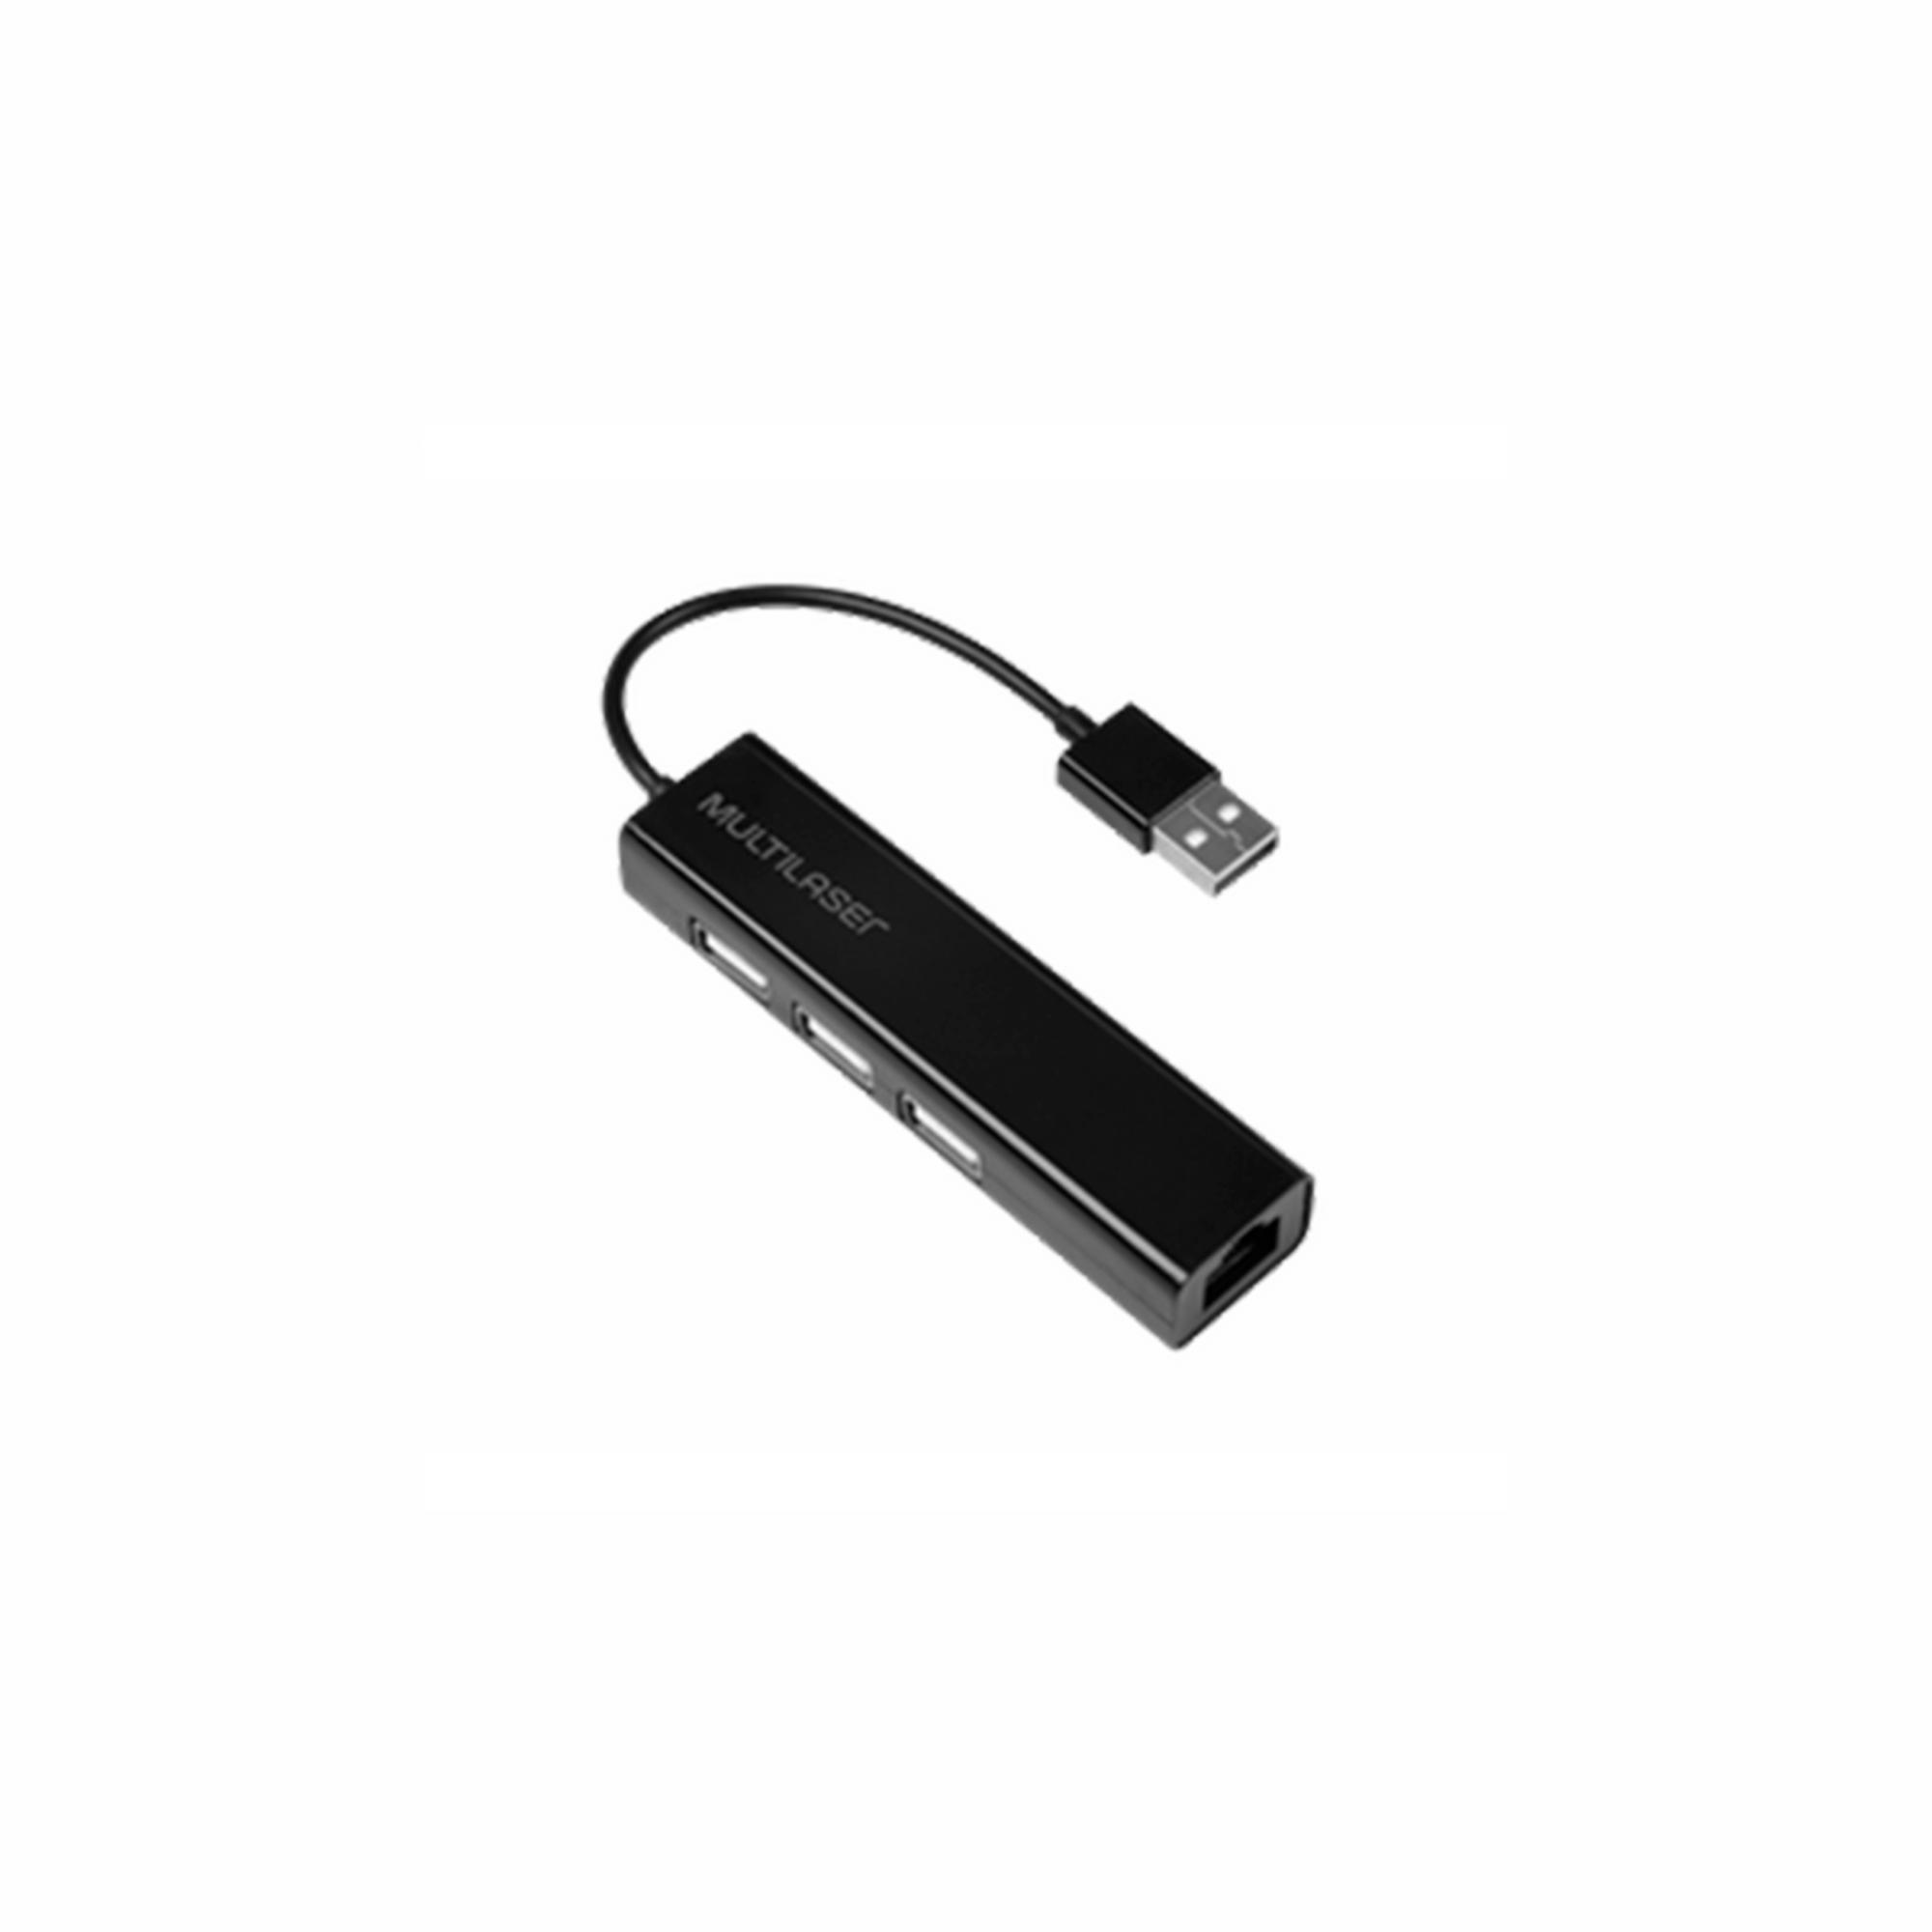 AC HUB USB 2.0 3P +RJ45 PRE FEM AC304 MU